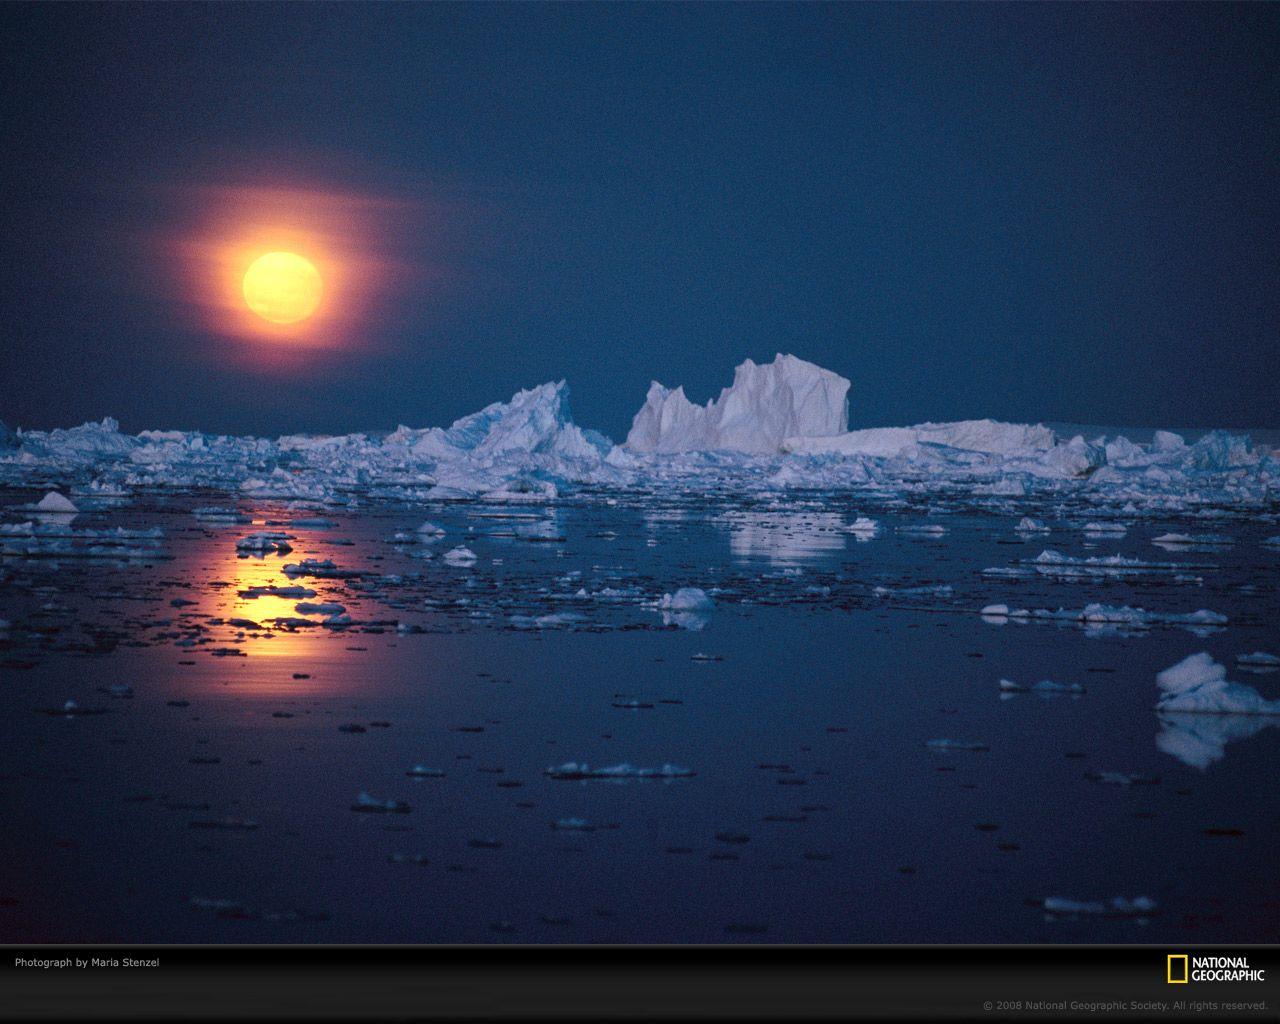 moon-antarctica-ice-687149-xl.jpg (1280×1024)